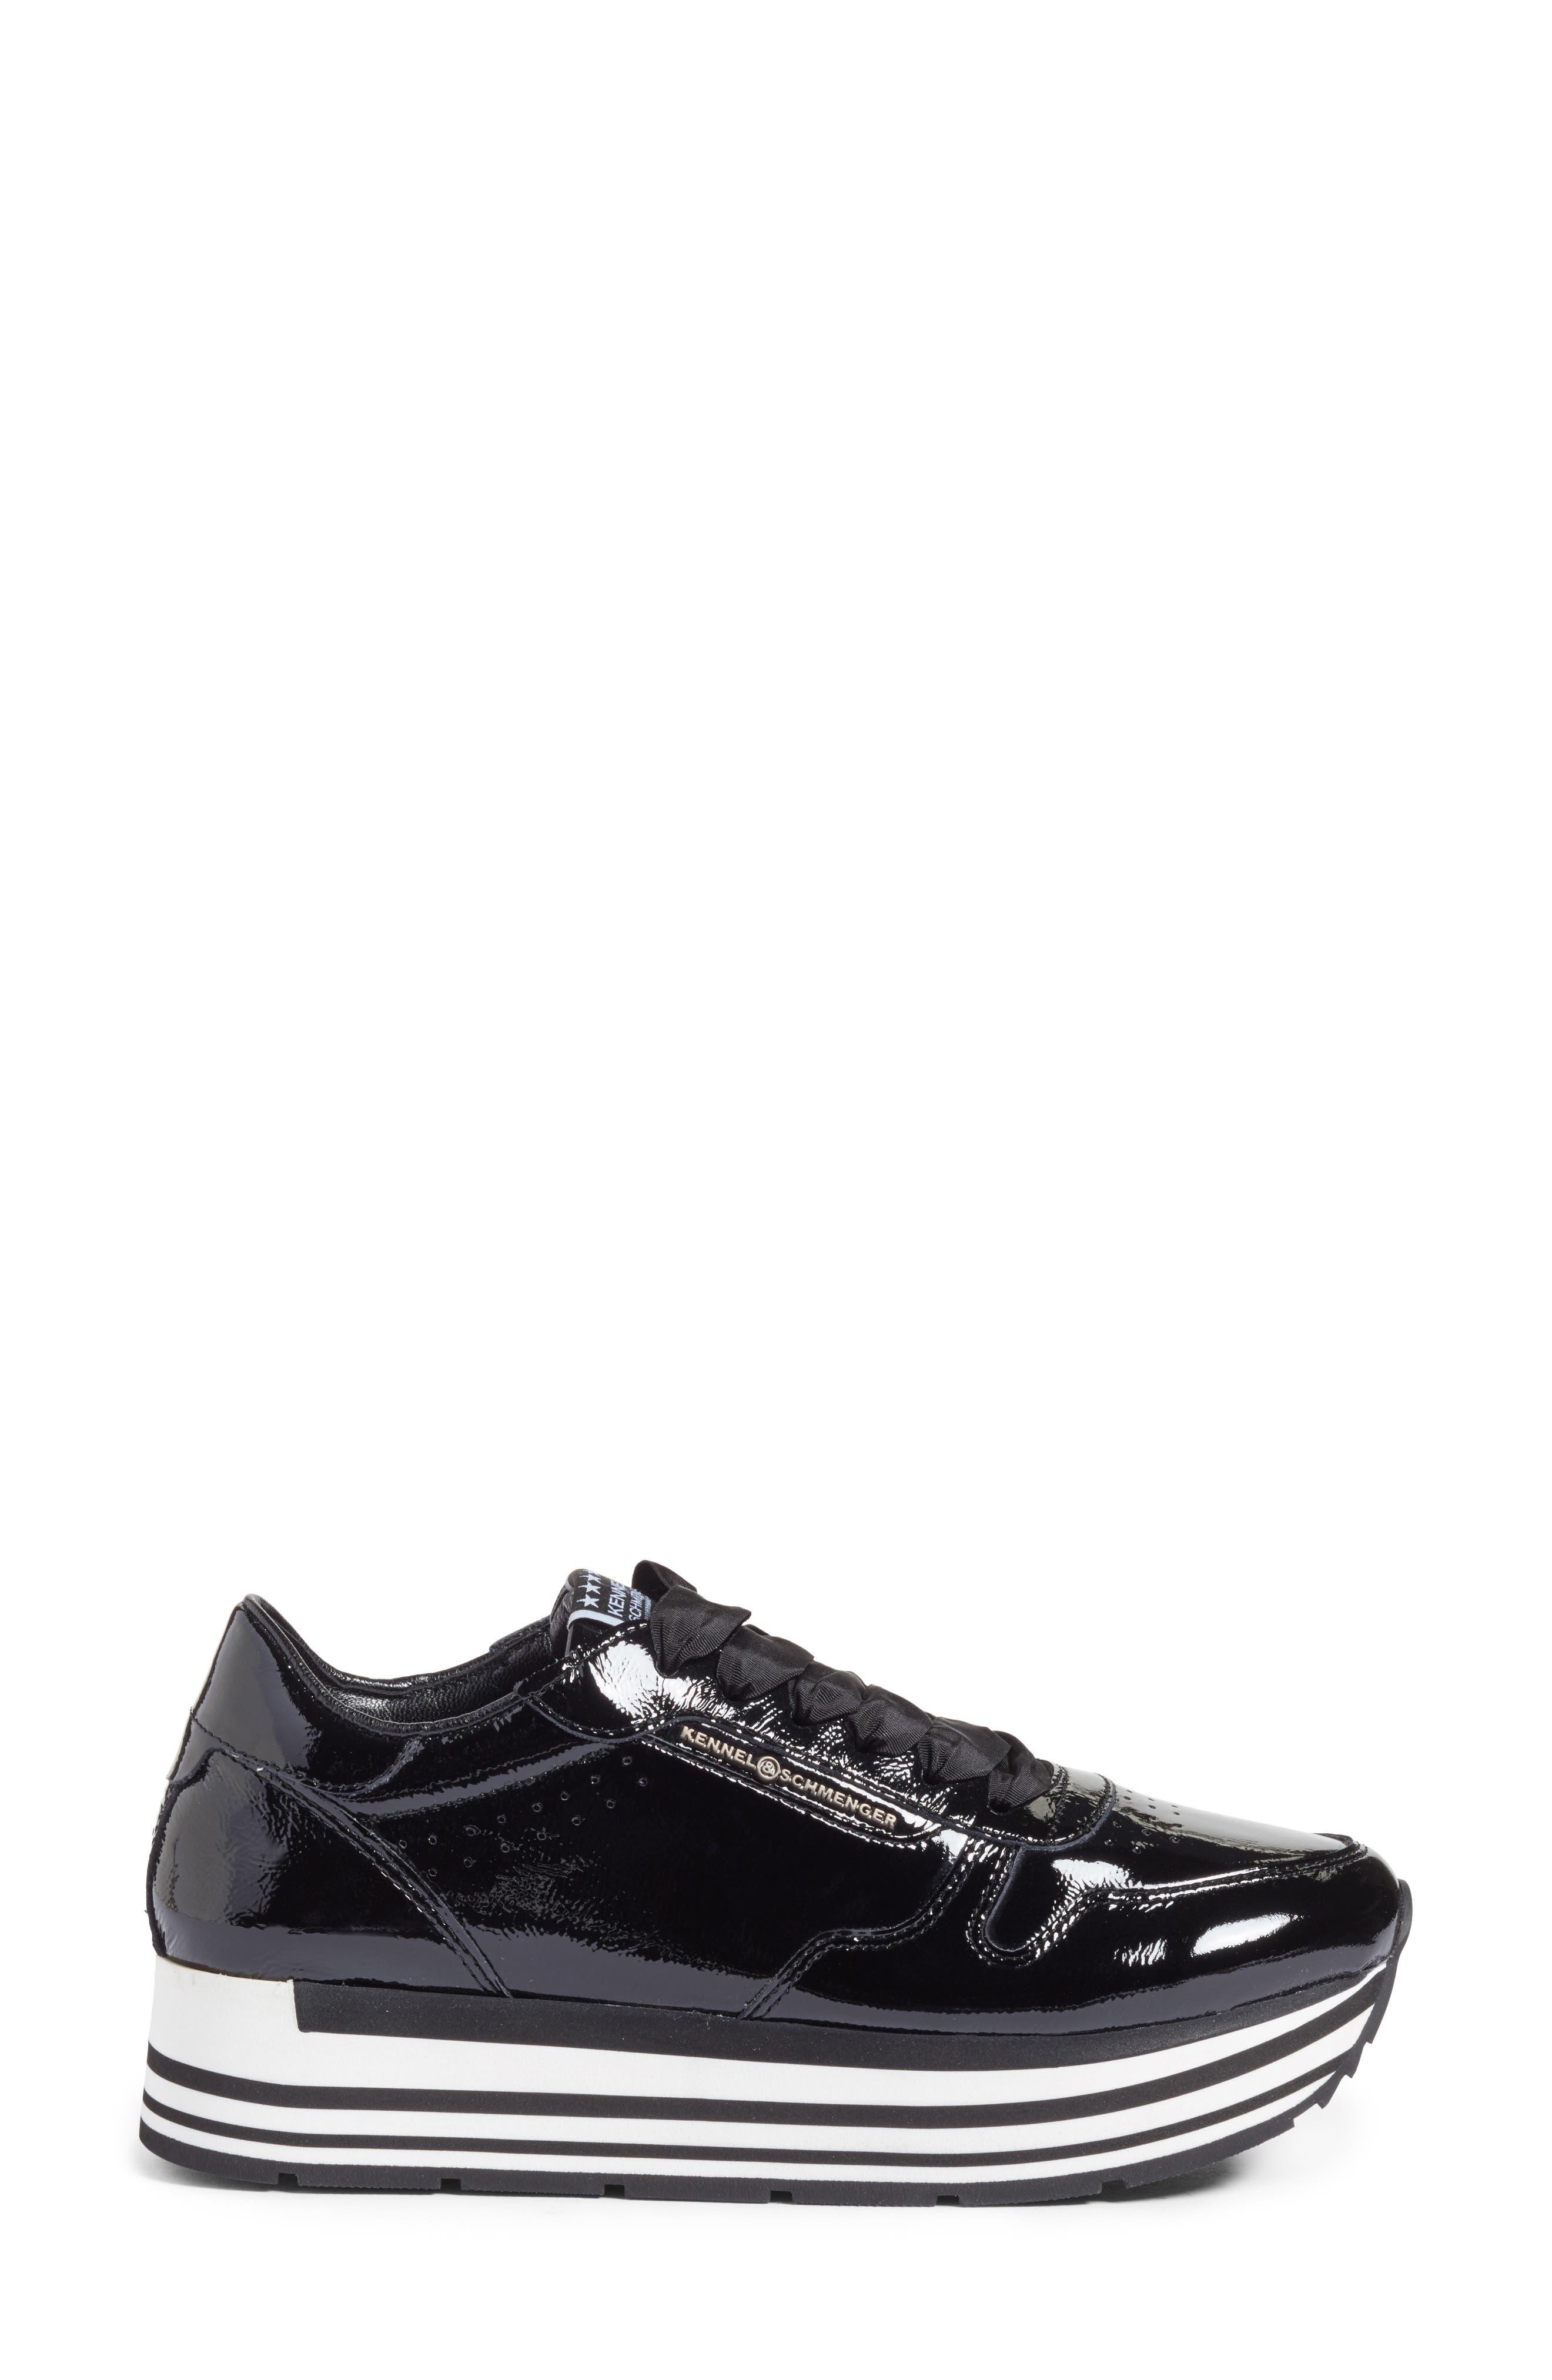 Kennel & Schmenger Nova Patent Leather Sneaker,                             Alternate thumbnail 3, color,                             Black